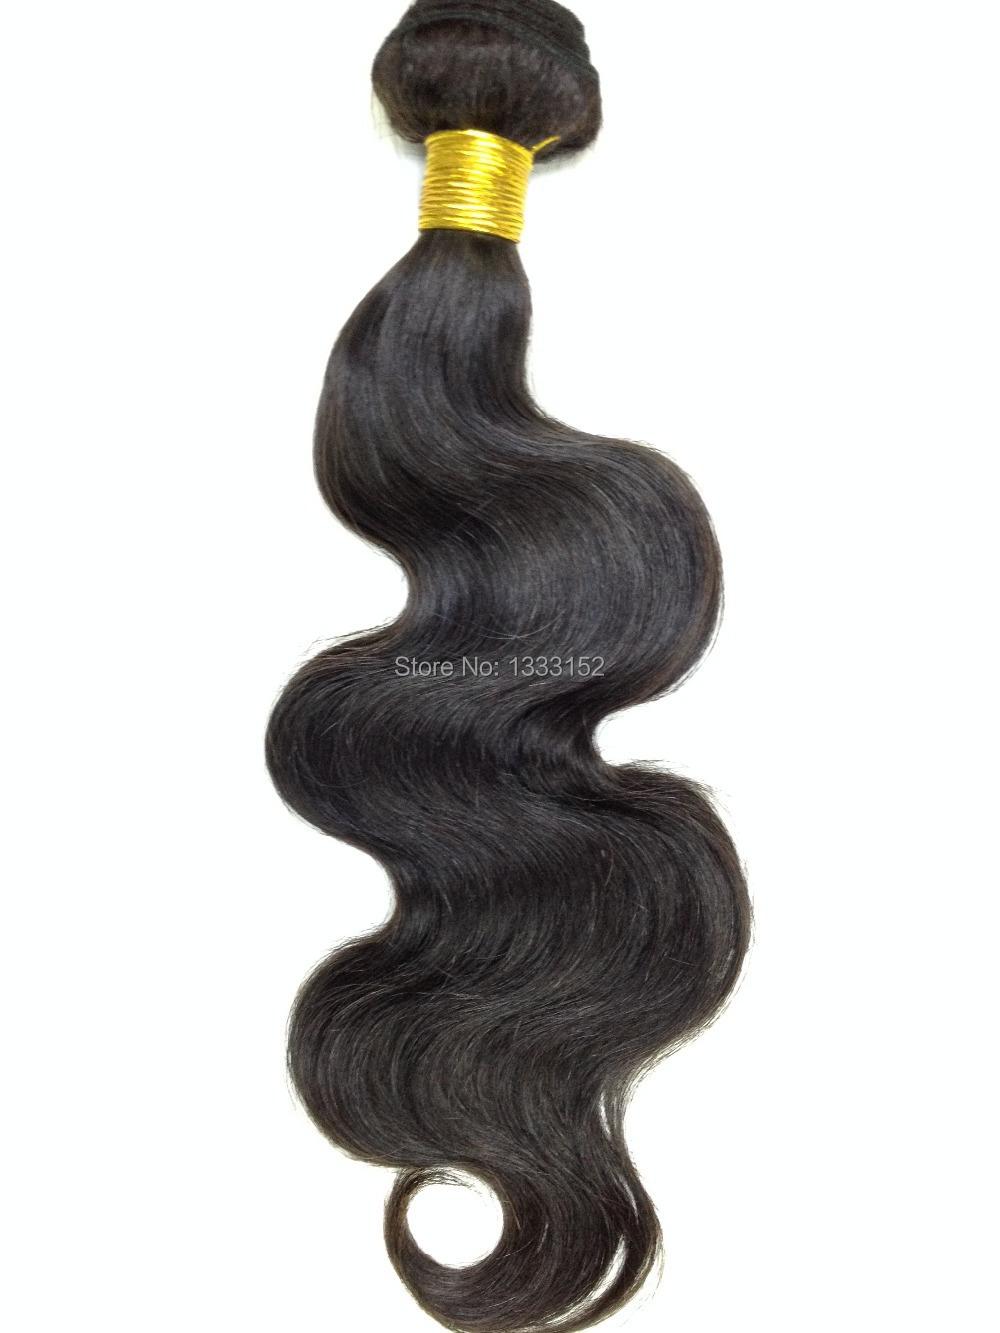 Premium Now Hair Extensions Extension Premium Now Hair